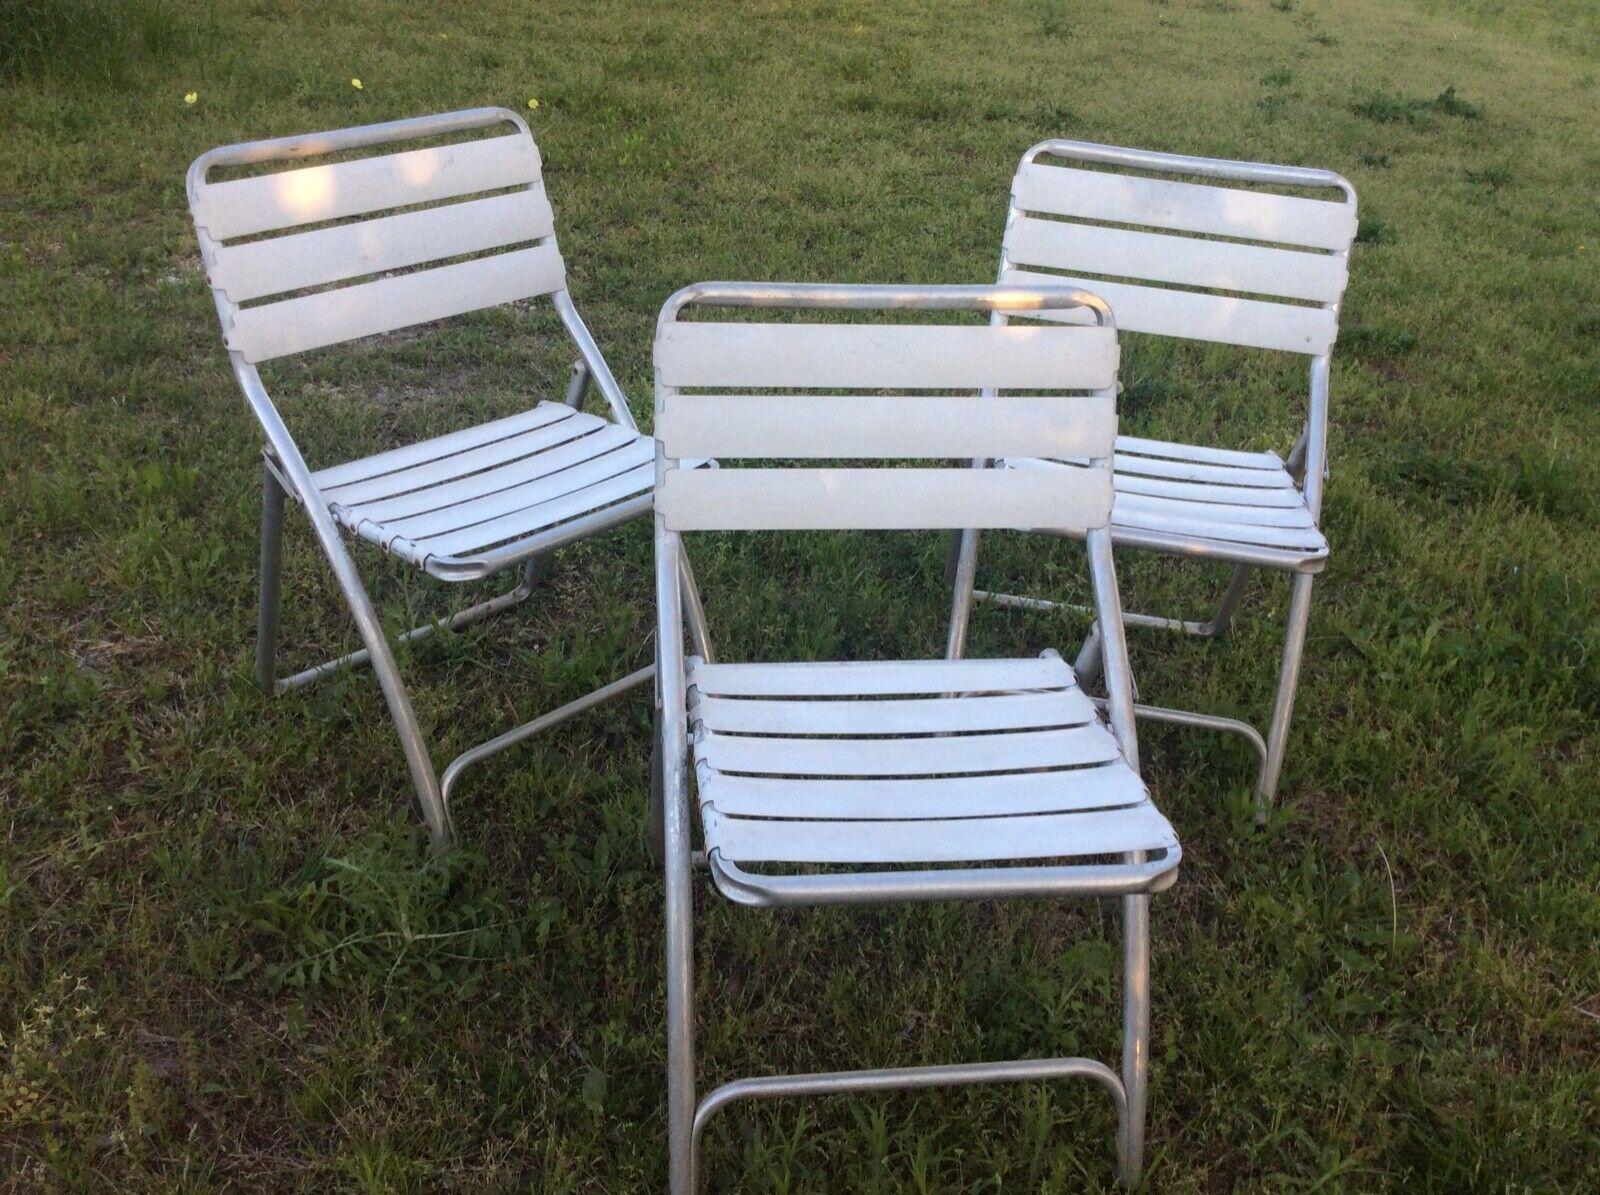 3 Folding Chair Aluminum Lawn Mid Century Modern Metal Vtg Retro Patio